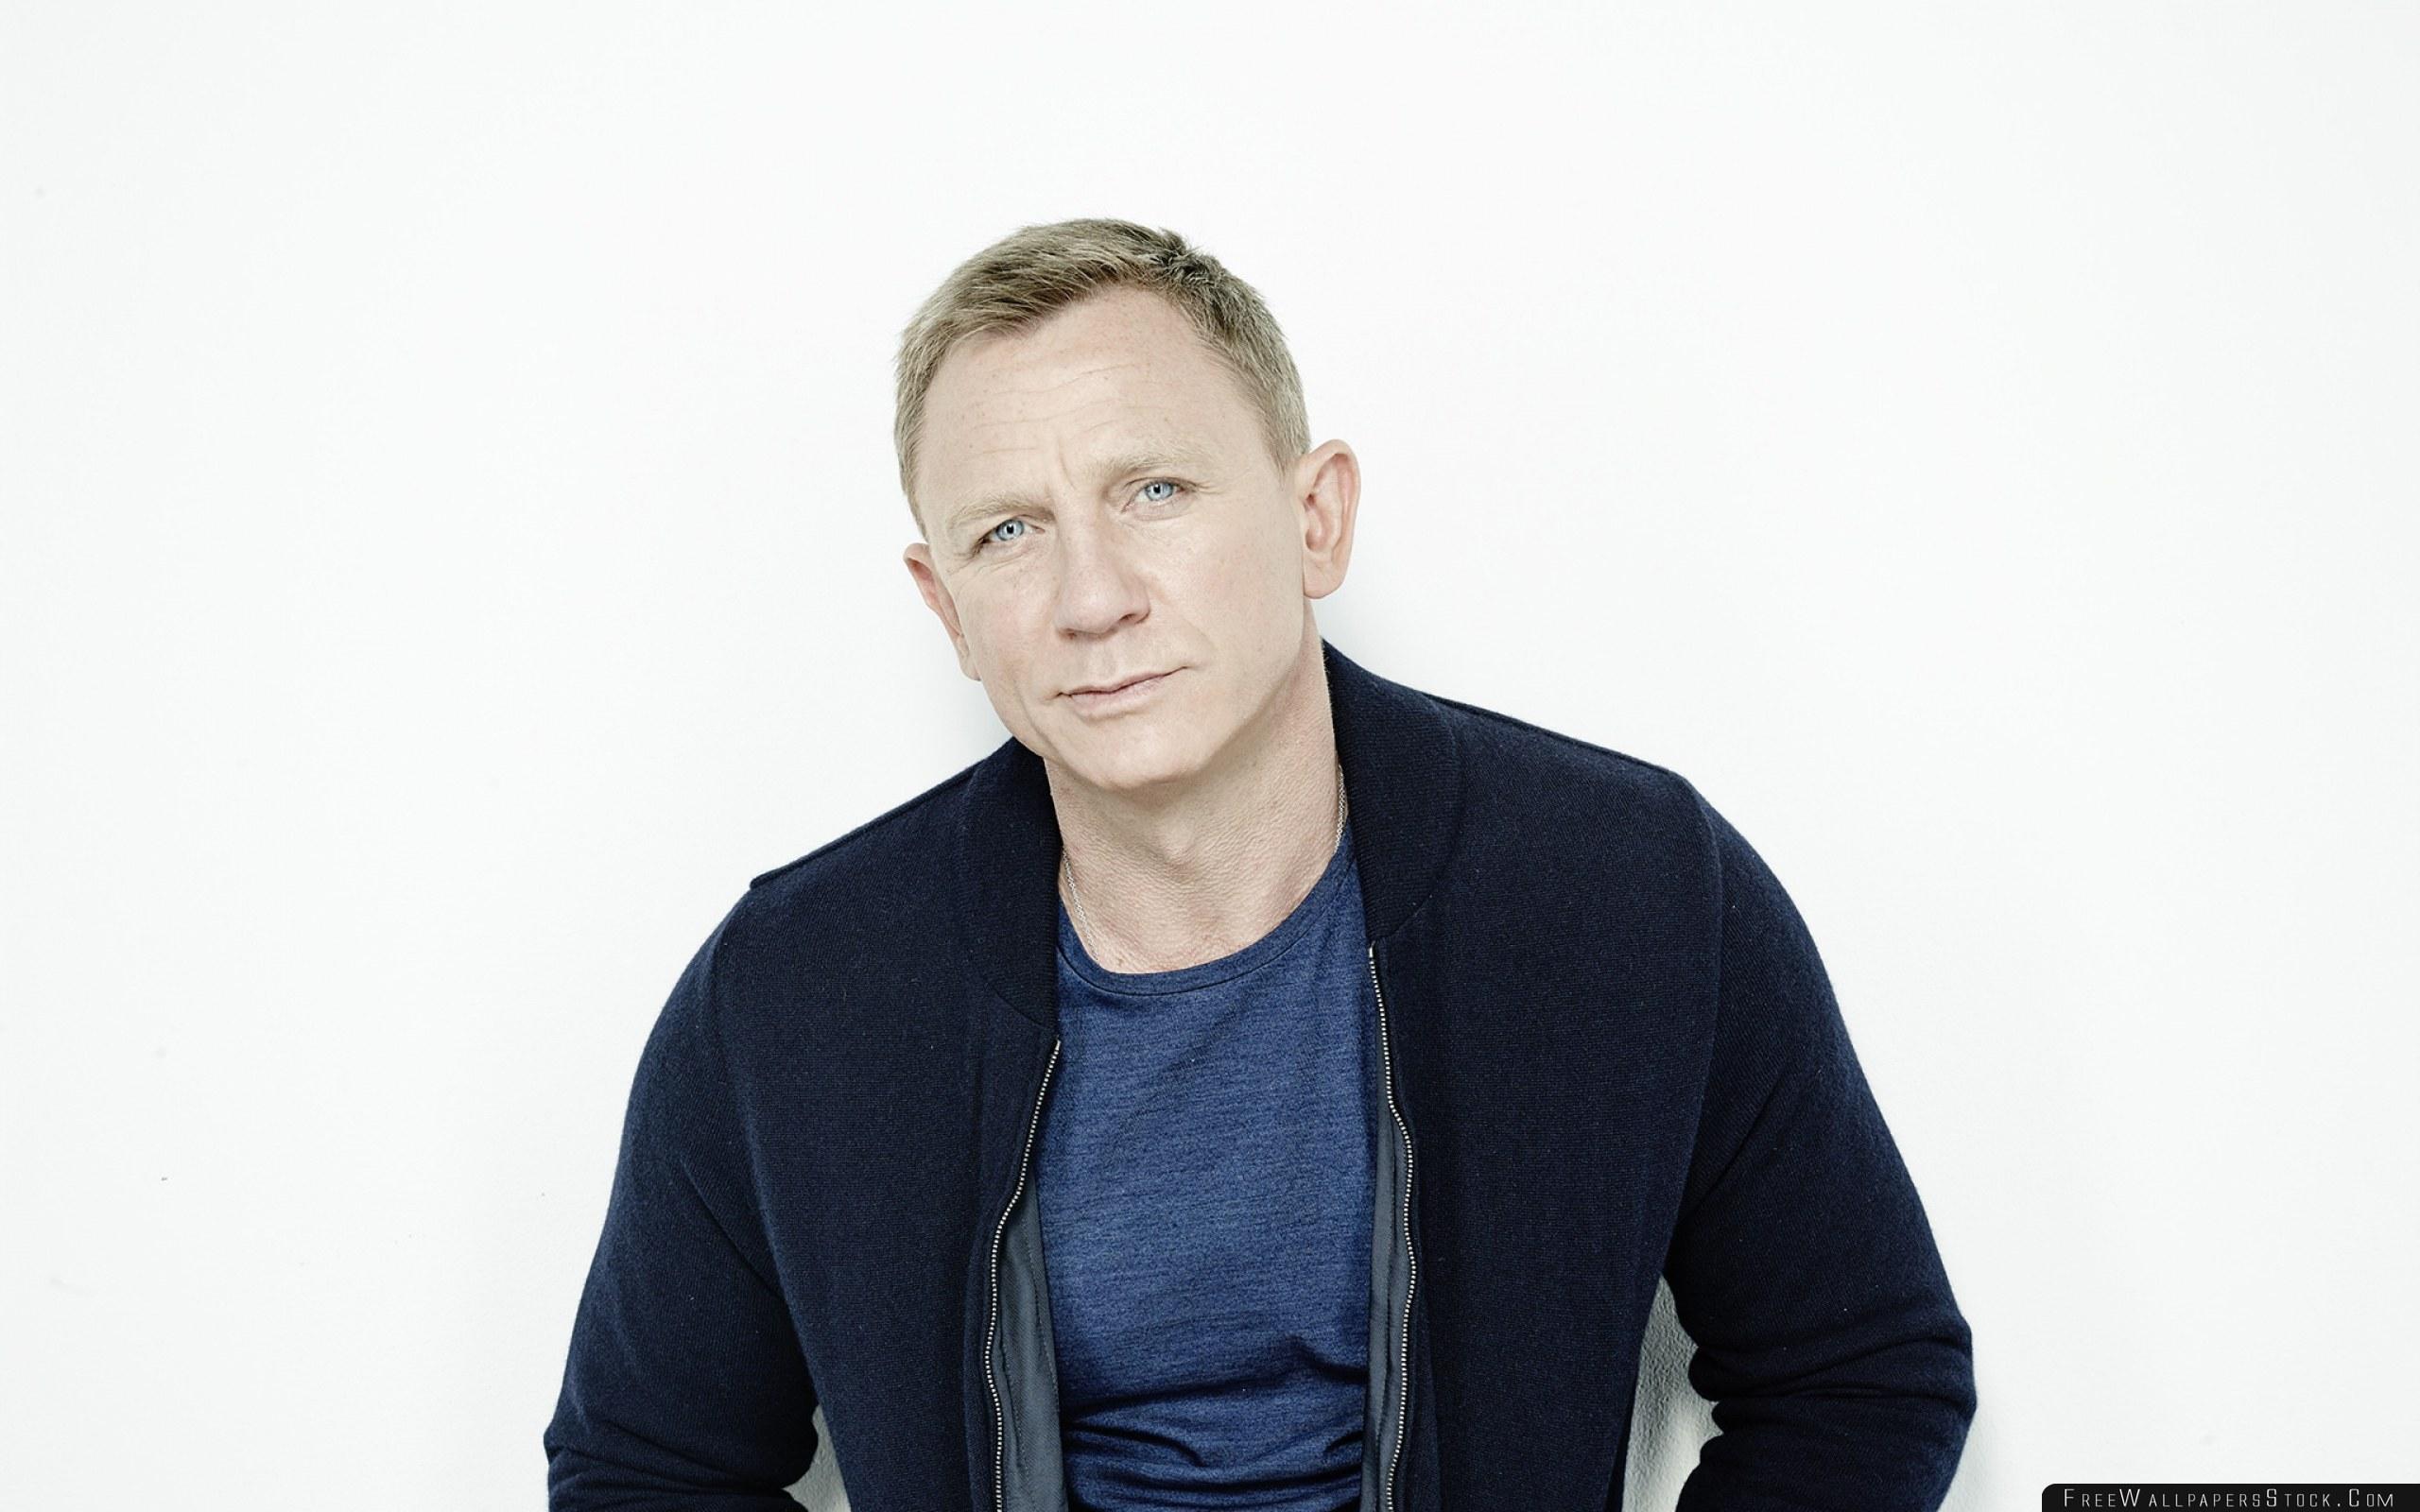 Download Free Wallpaper Daniel Craig Actor Jacket Photo Shoot